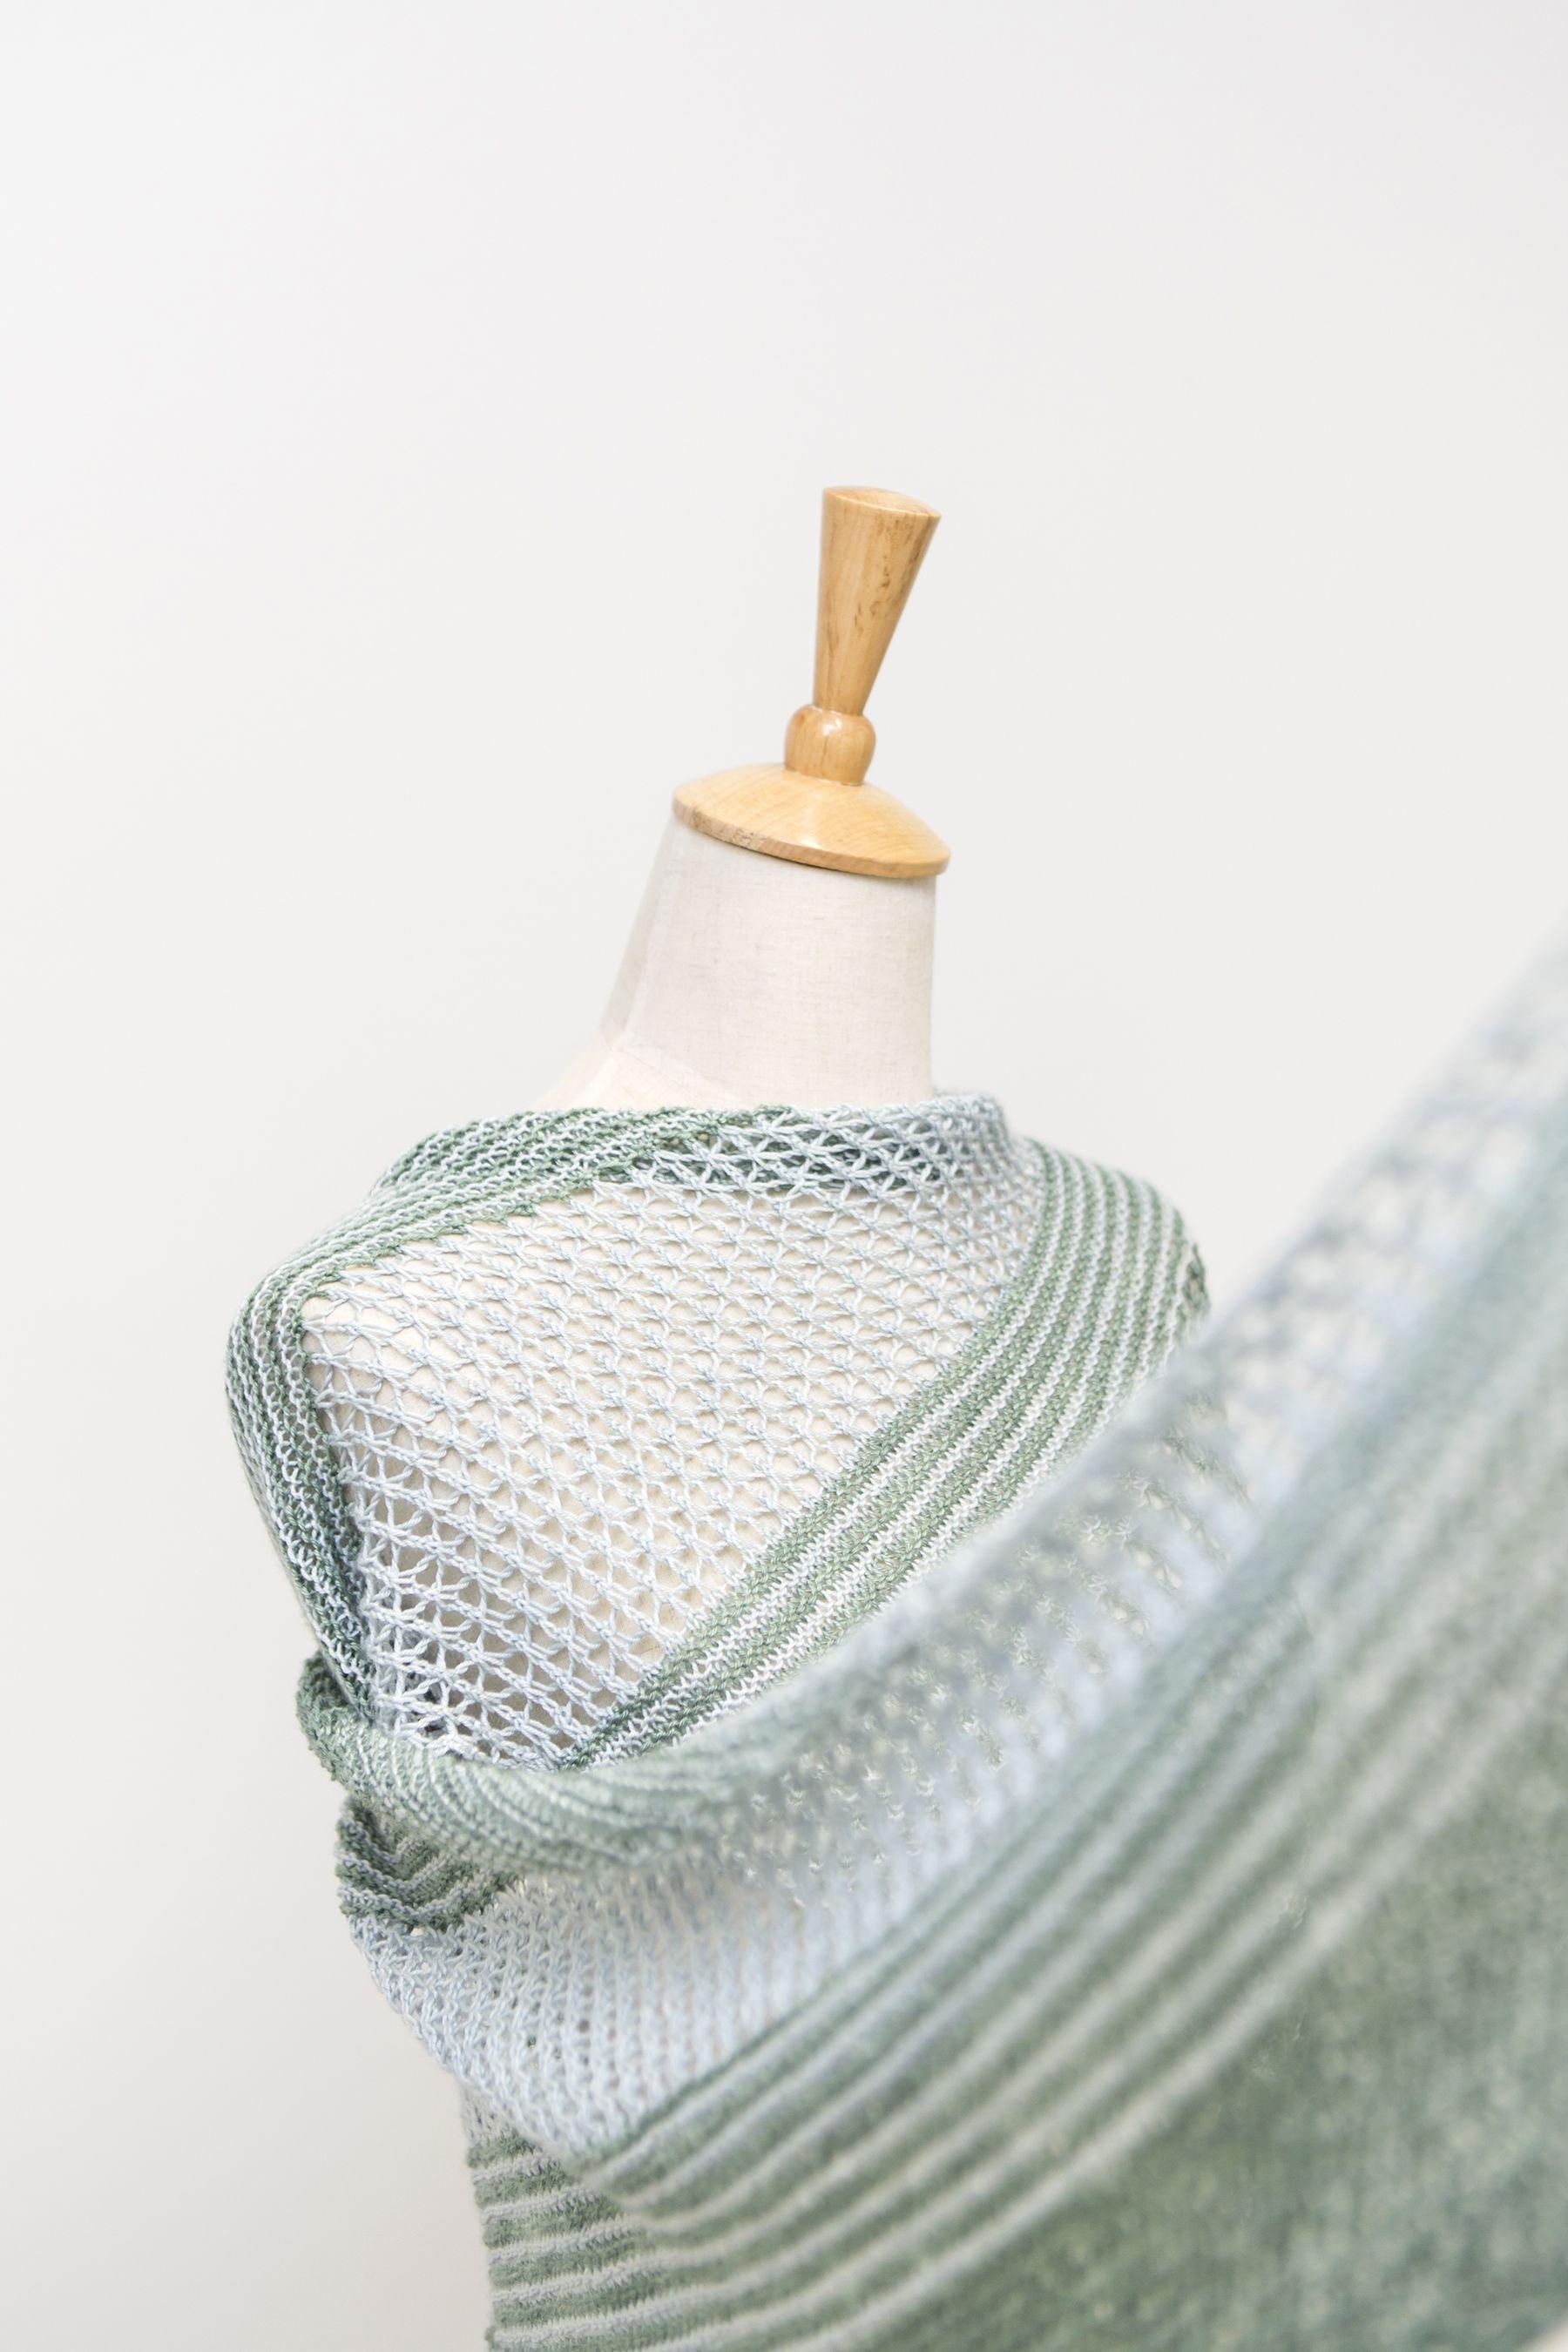 Ravelry: Sea Grass shawl with DyeForYarn Merino/Silk Fingering - knitting pattern by Janina Kallio.